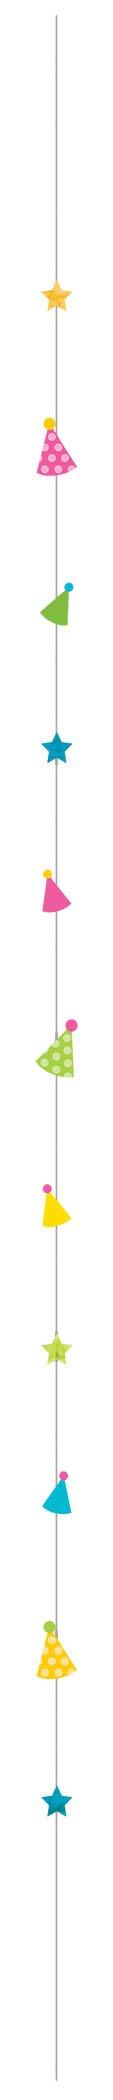 Balloon Fun Strings Party Hat